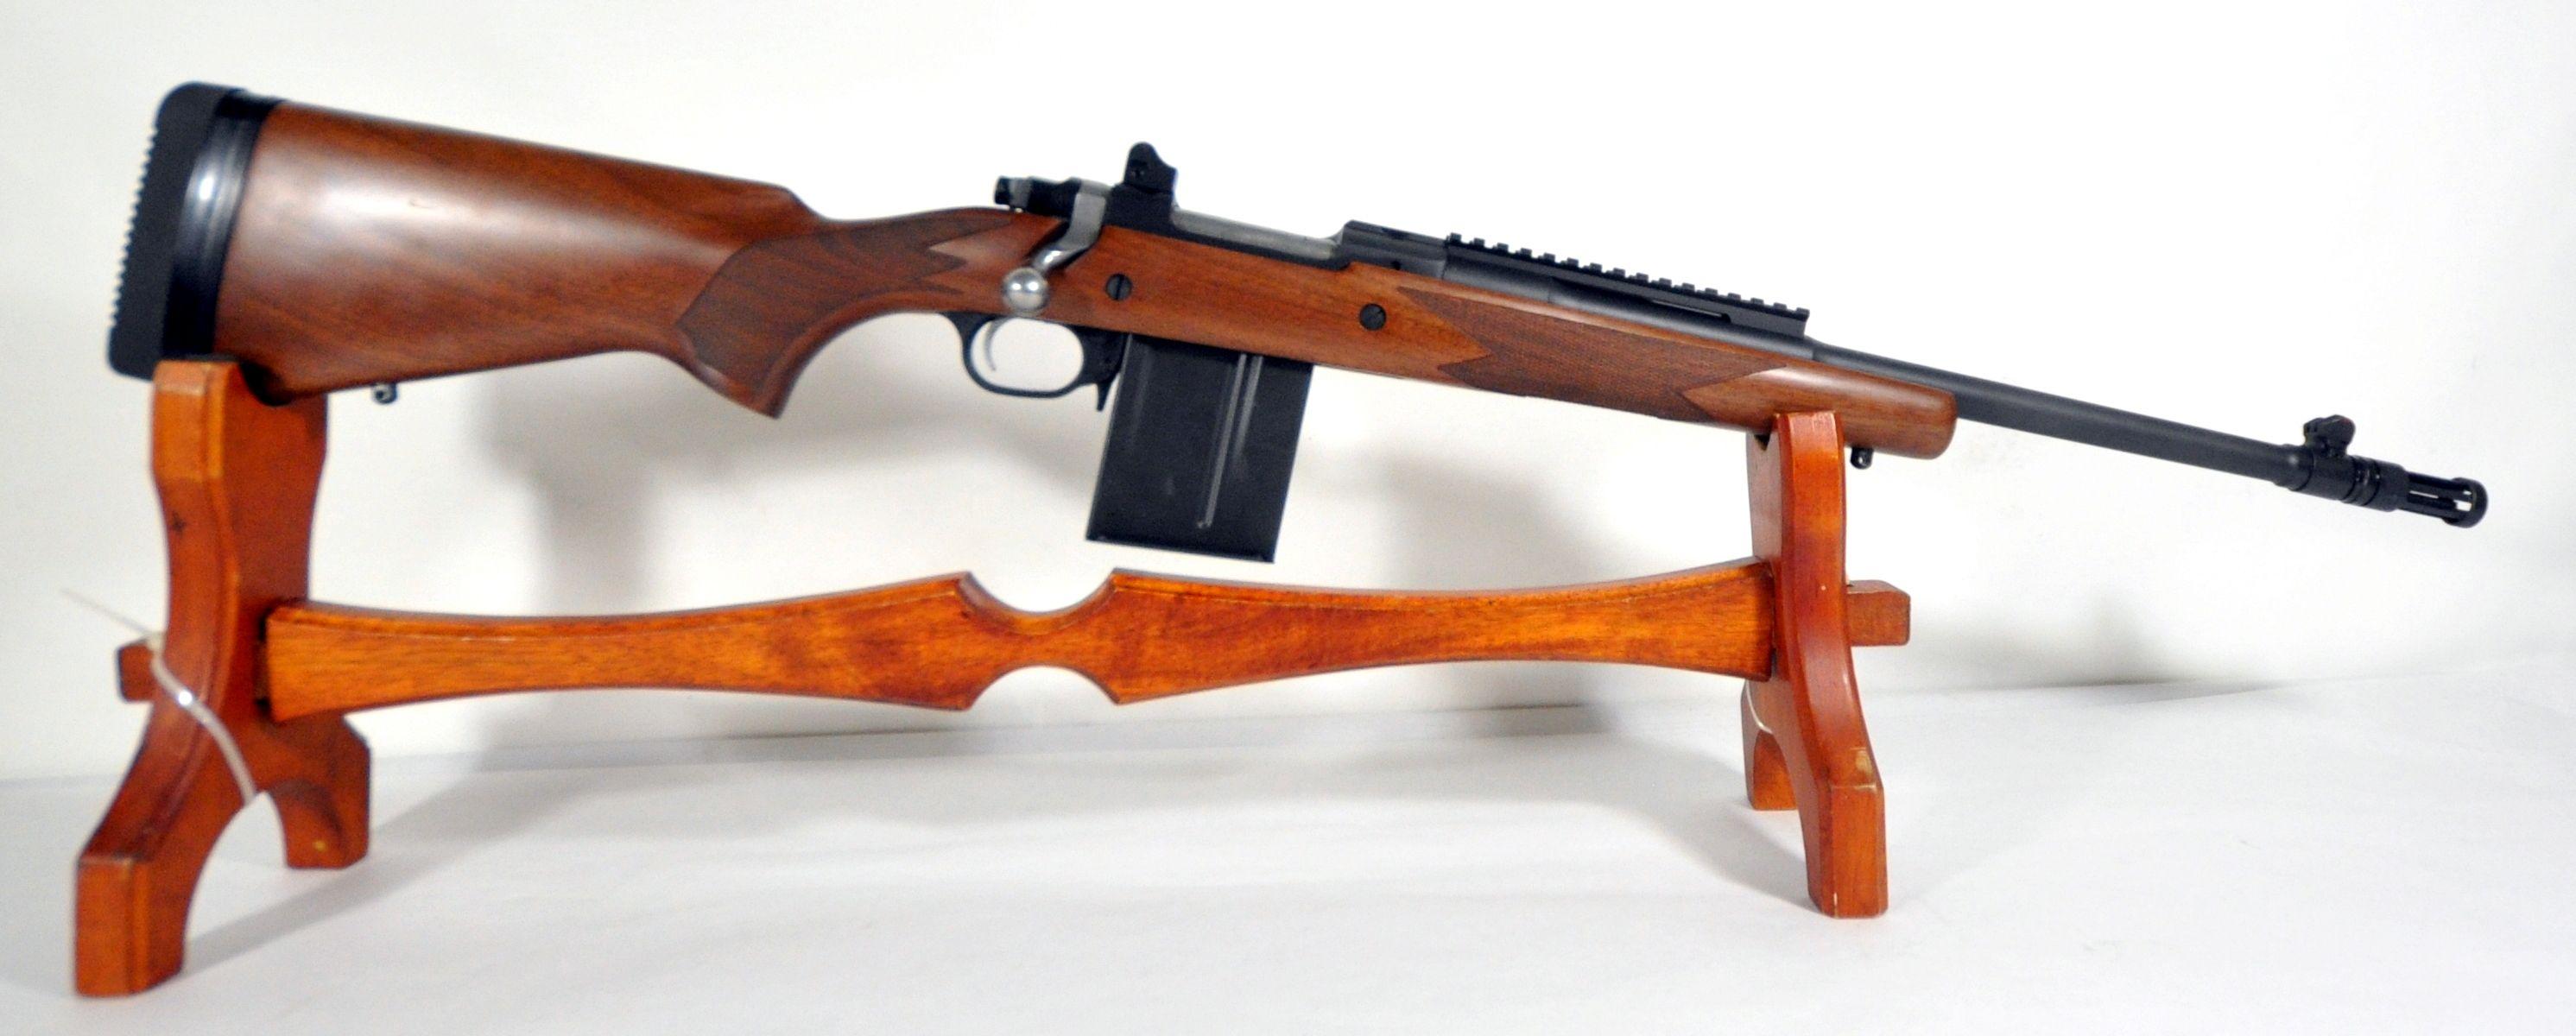 Ruger M77 Gunsight Scout Rifle  308 Win 16 5